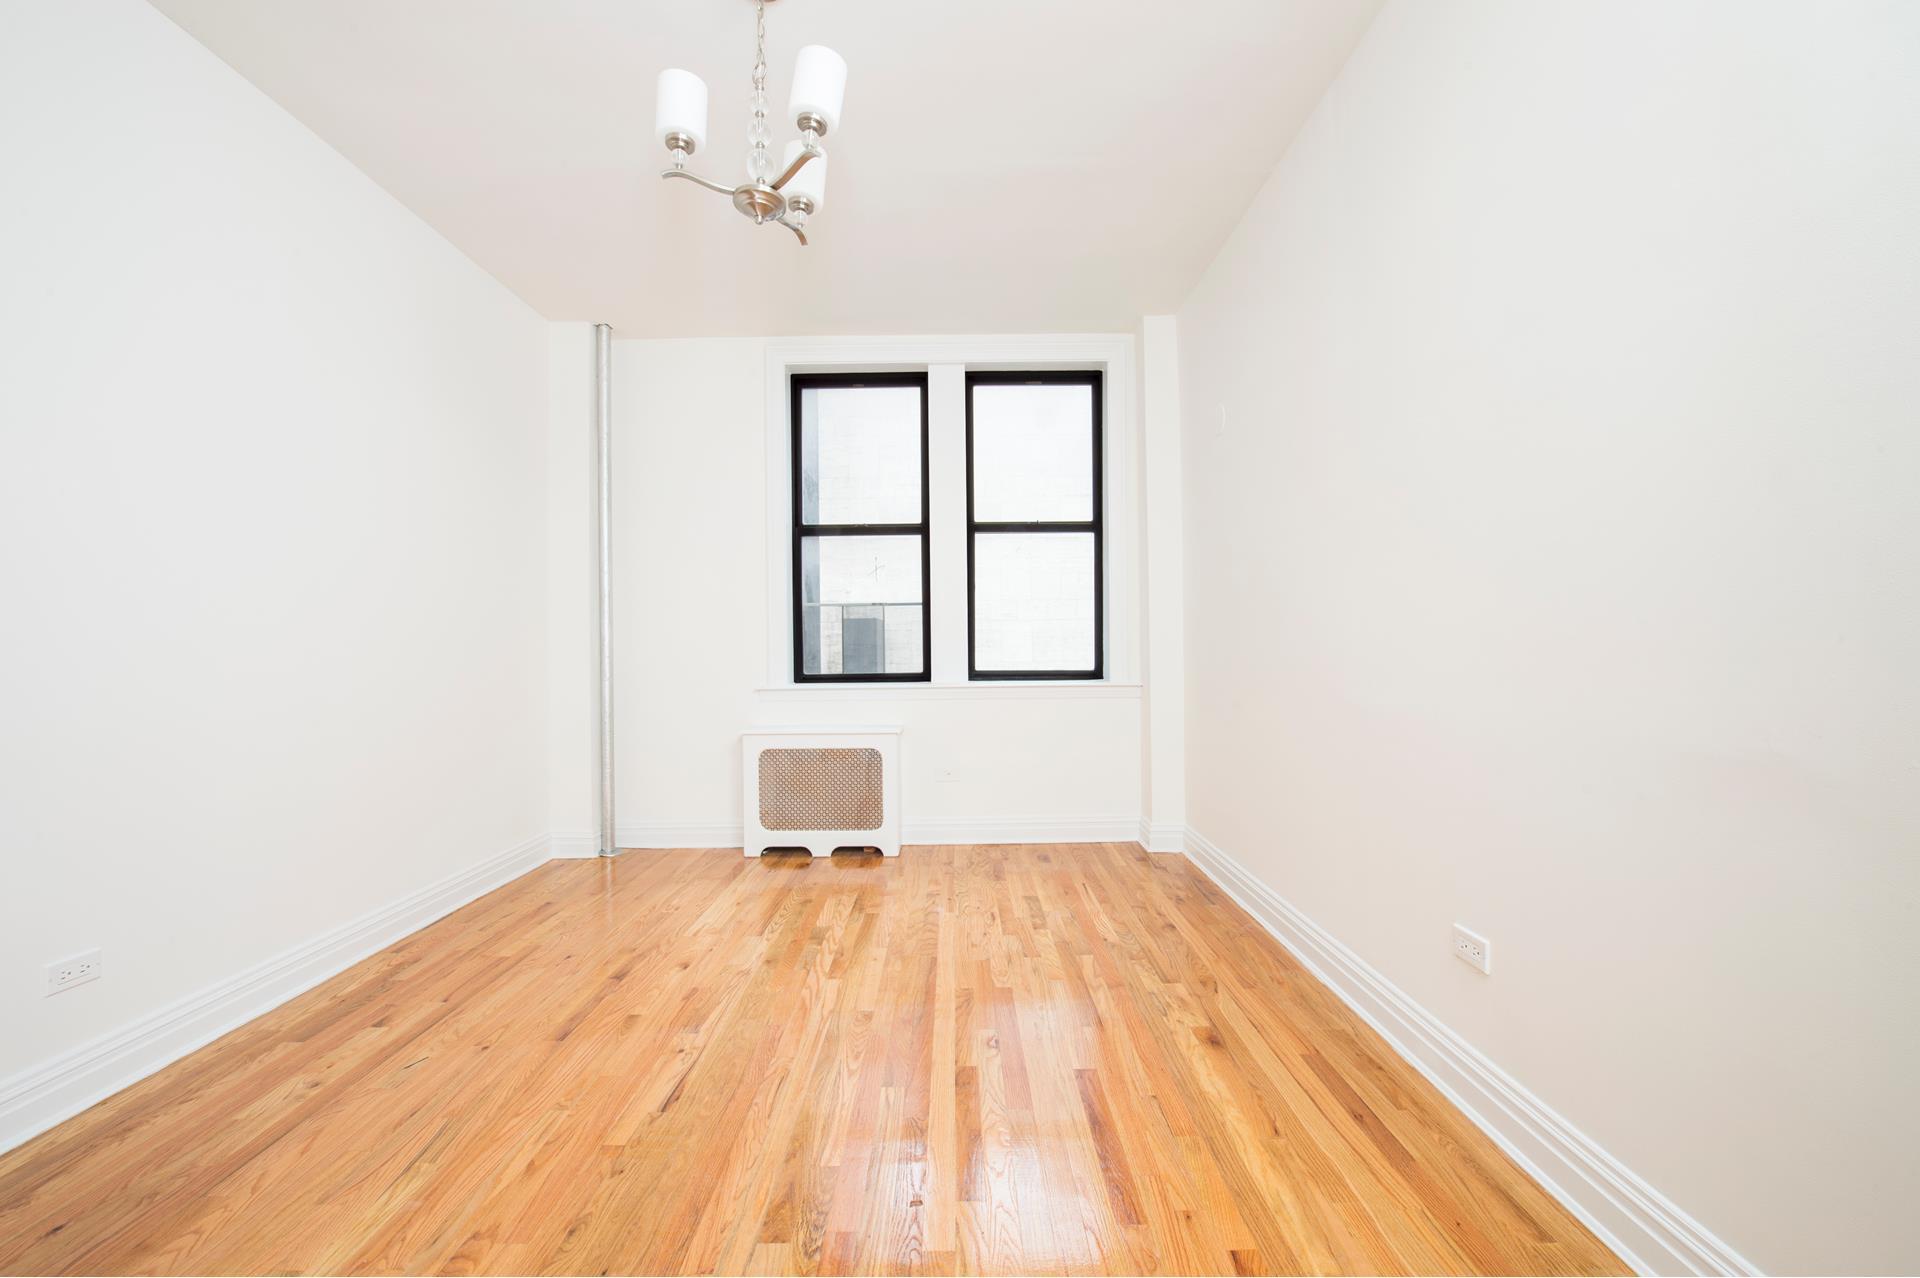 245 West 51st St, 303 - Midtown, New York